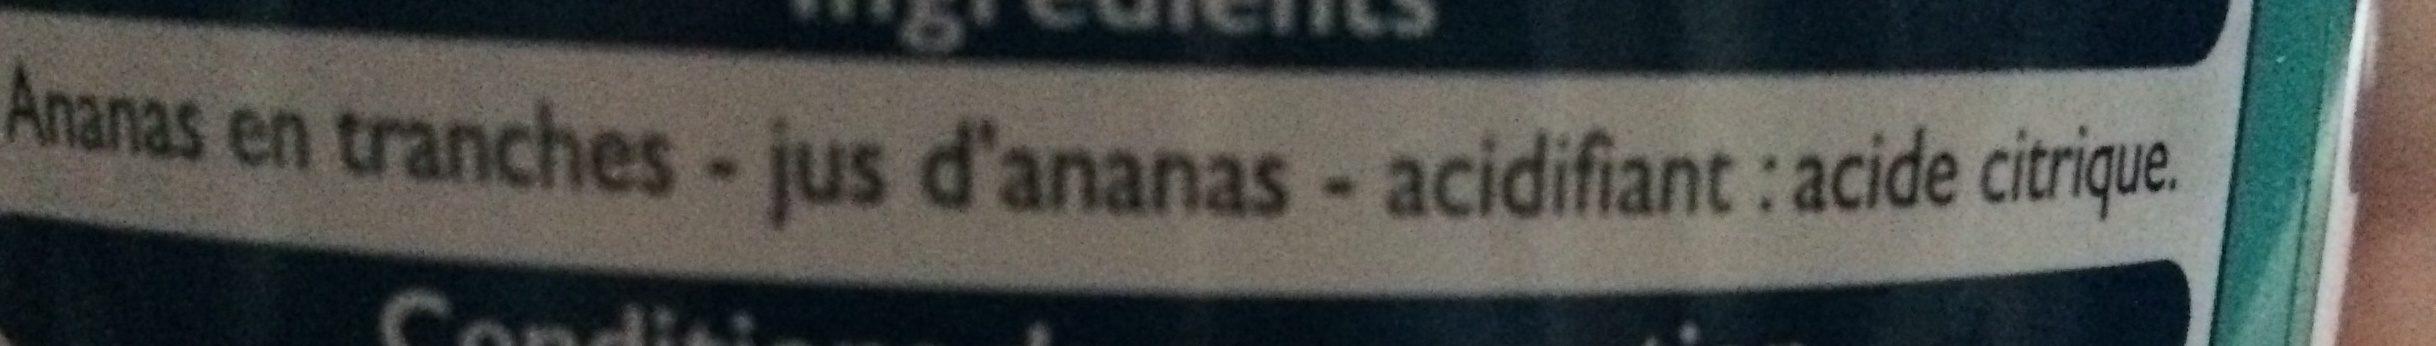 Ananas en tranches - Ingrédients - fr